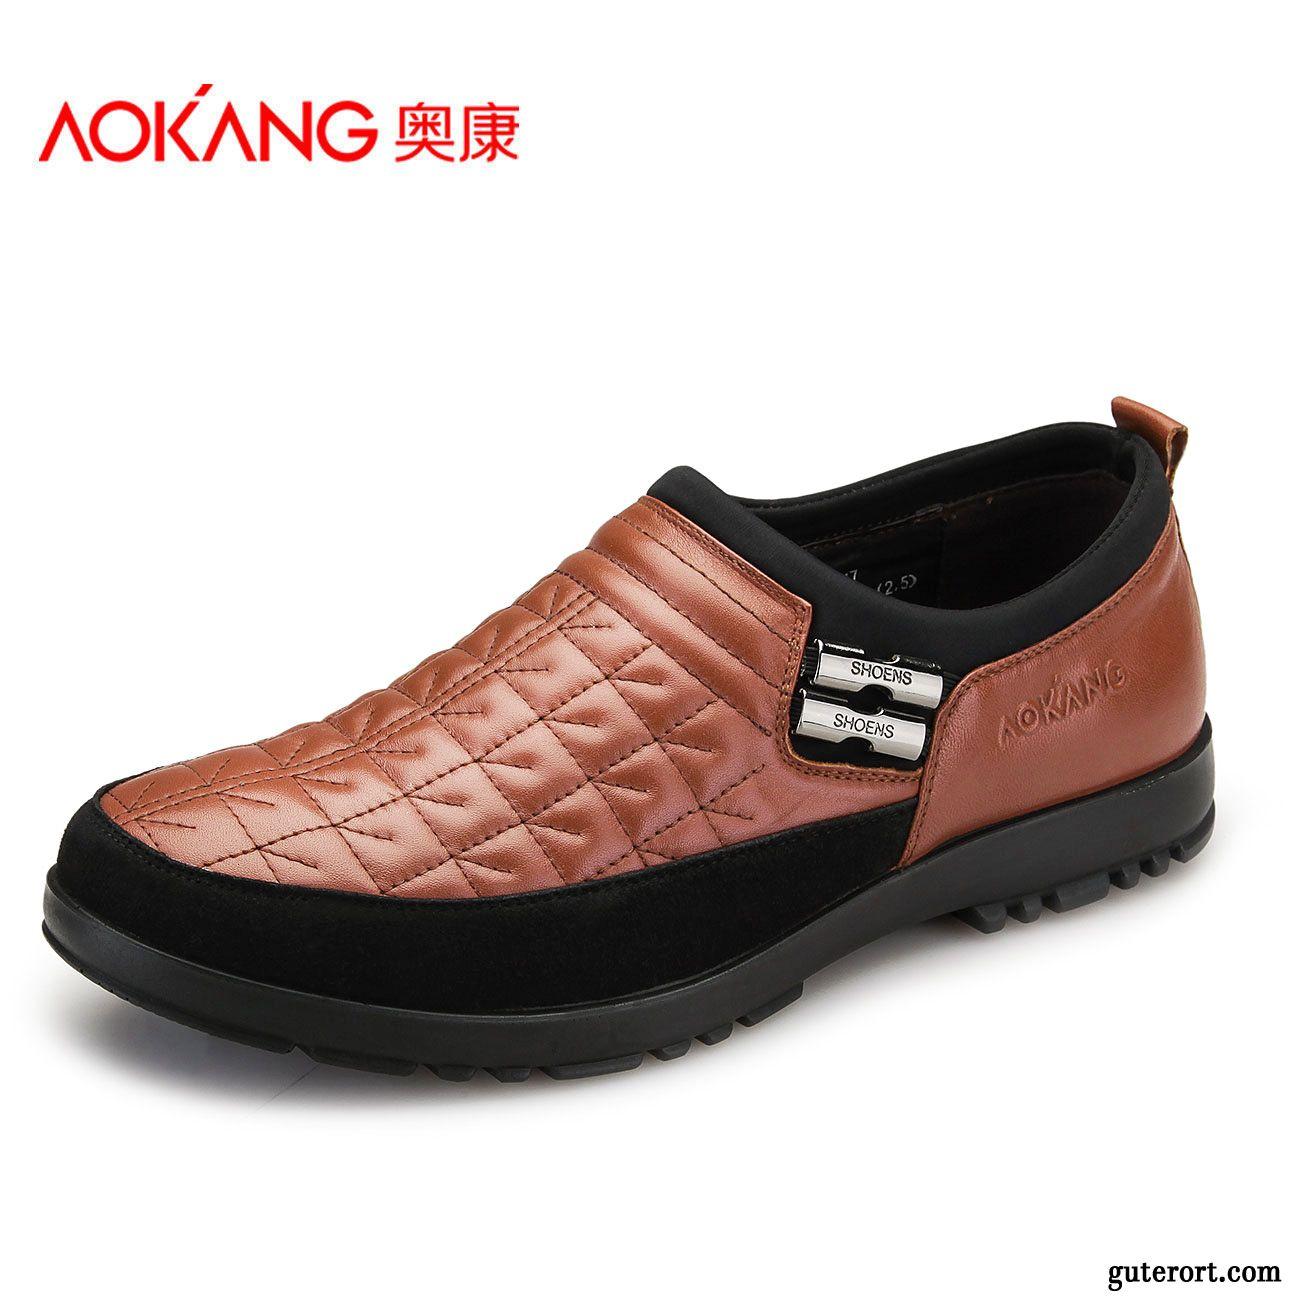 Schuhe leder cognac